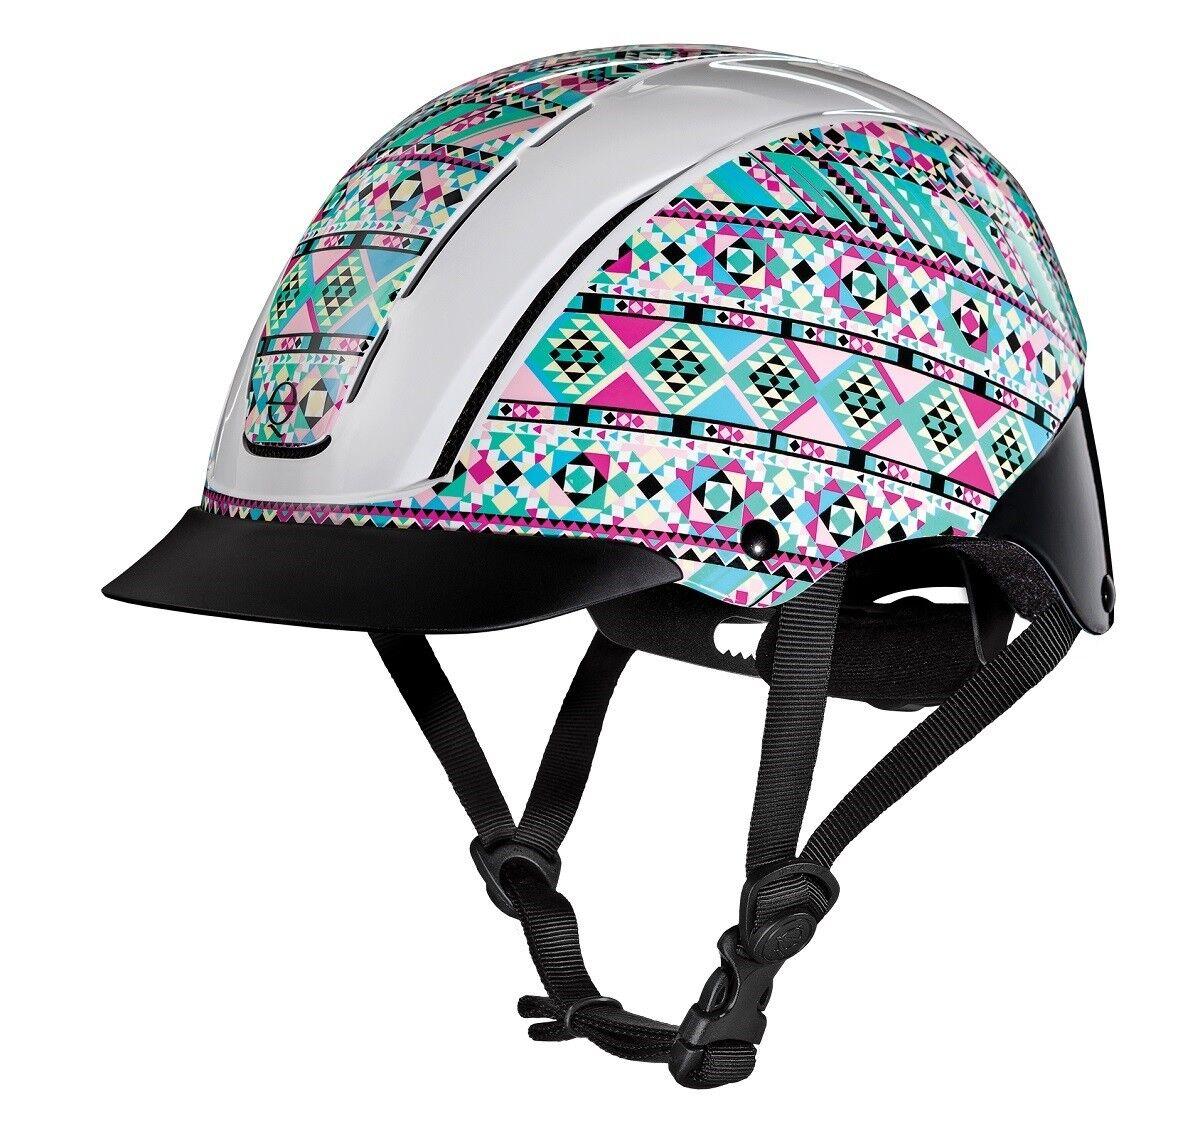 Troxel Spirit KALEIDOSCOPE Light Safety Horse Riding Training Adjustable Helmet